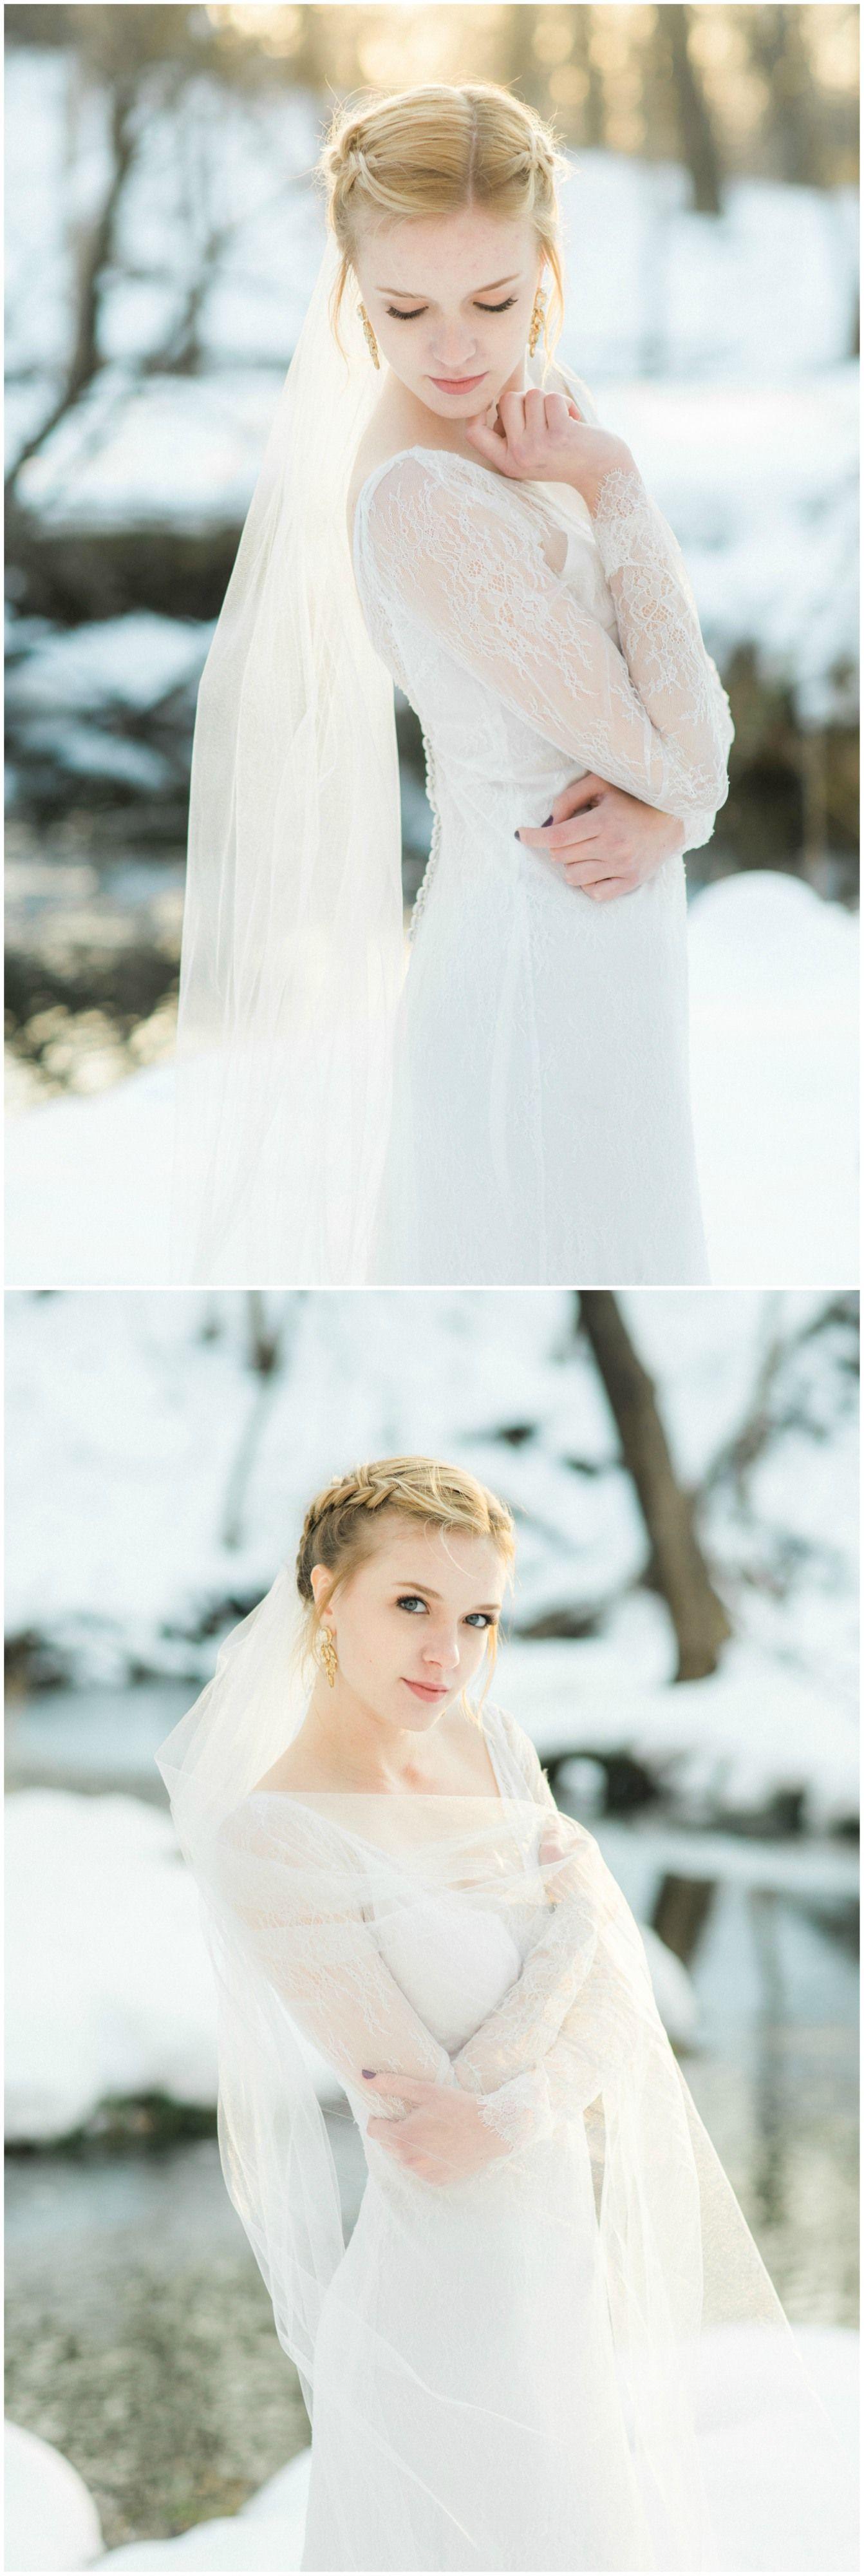 Longsleeve lace traditional yet modern wedding gown feminine